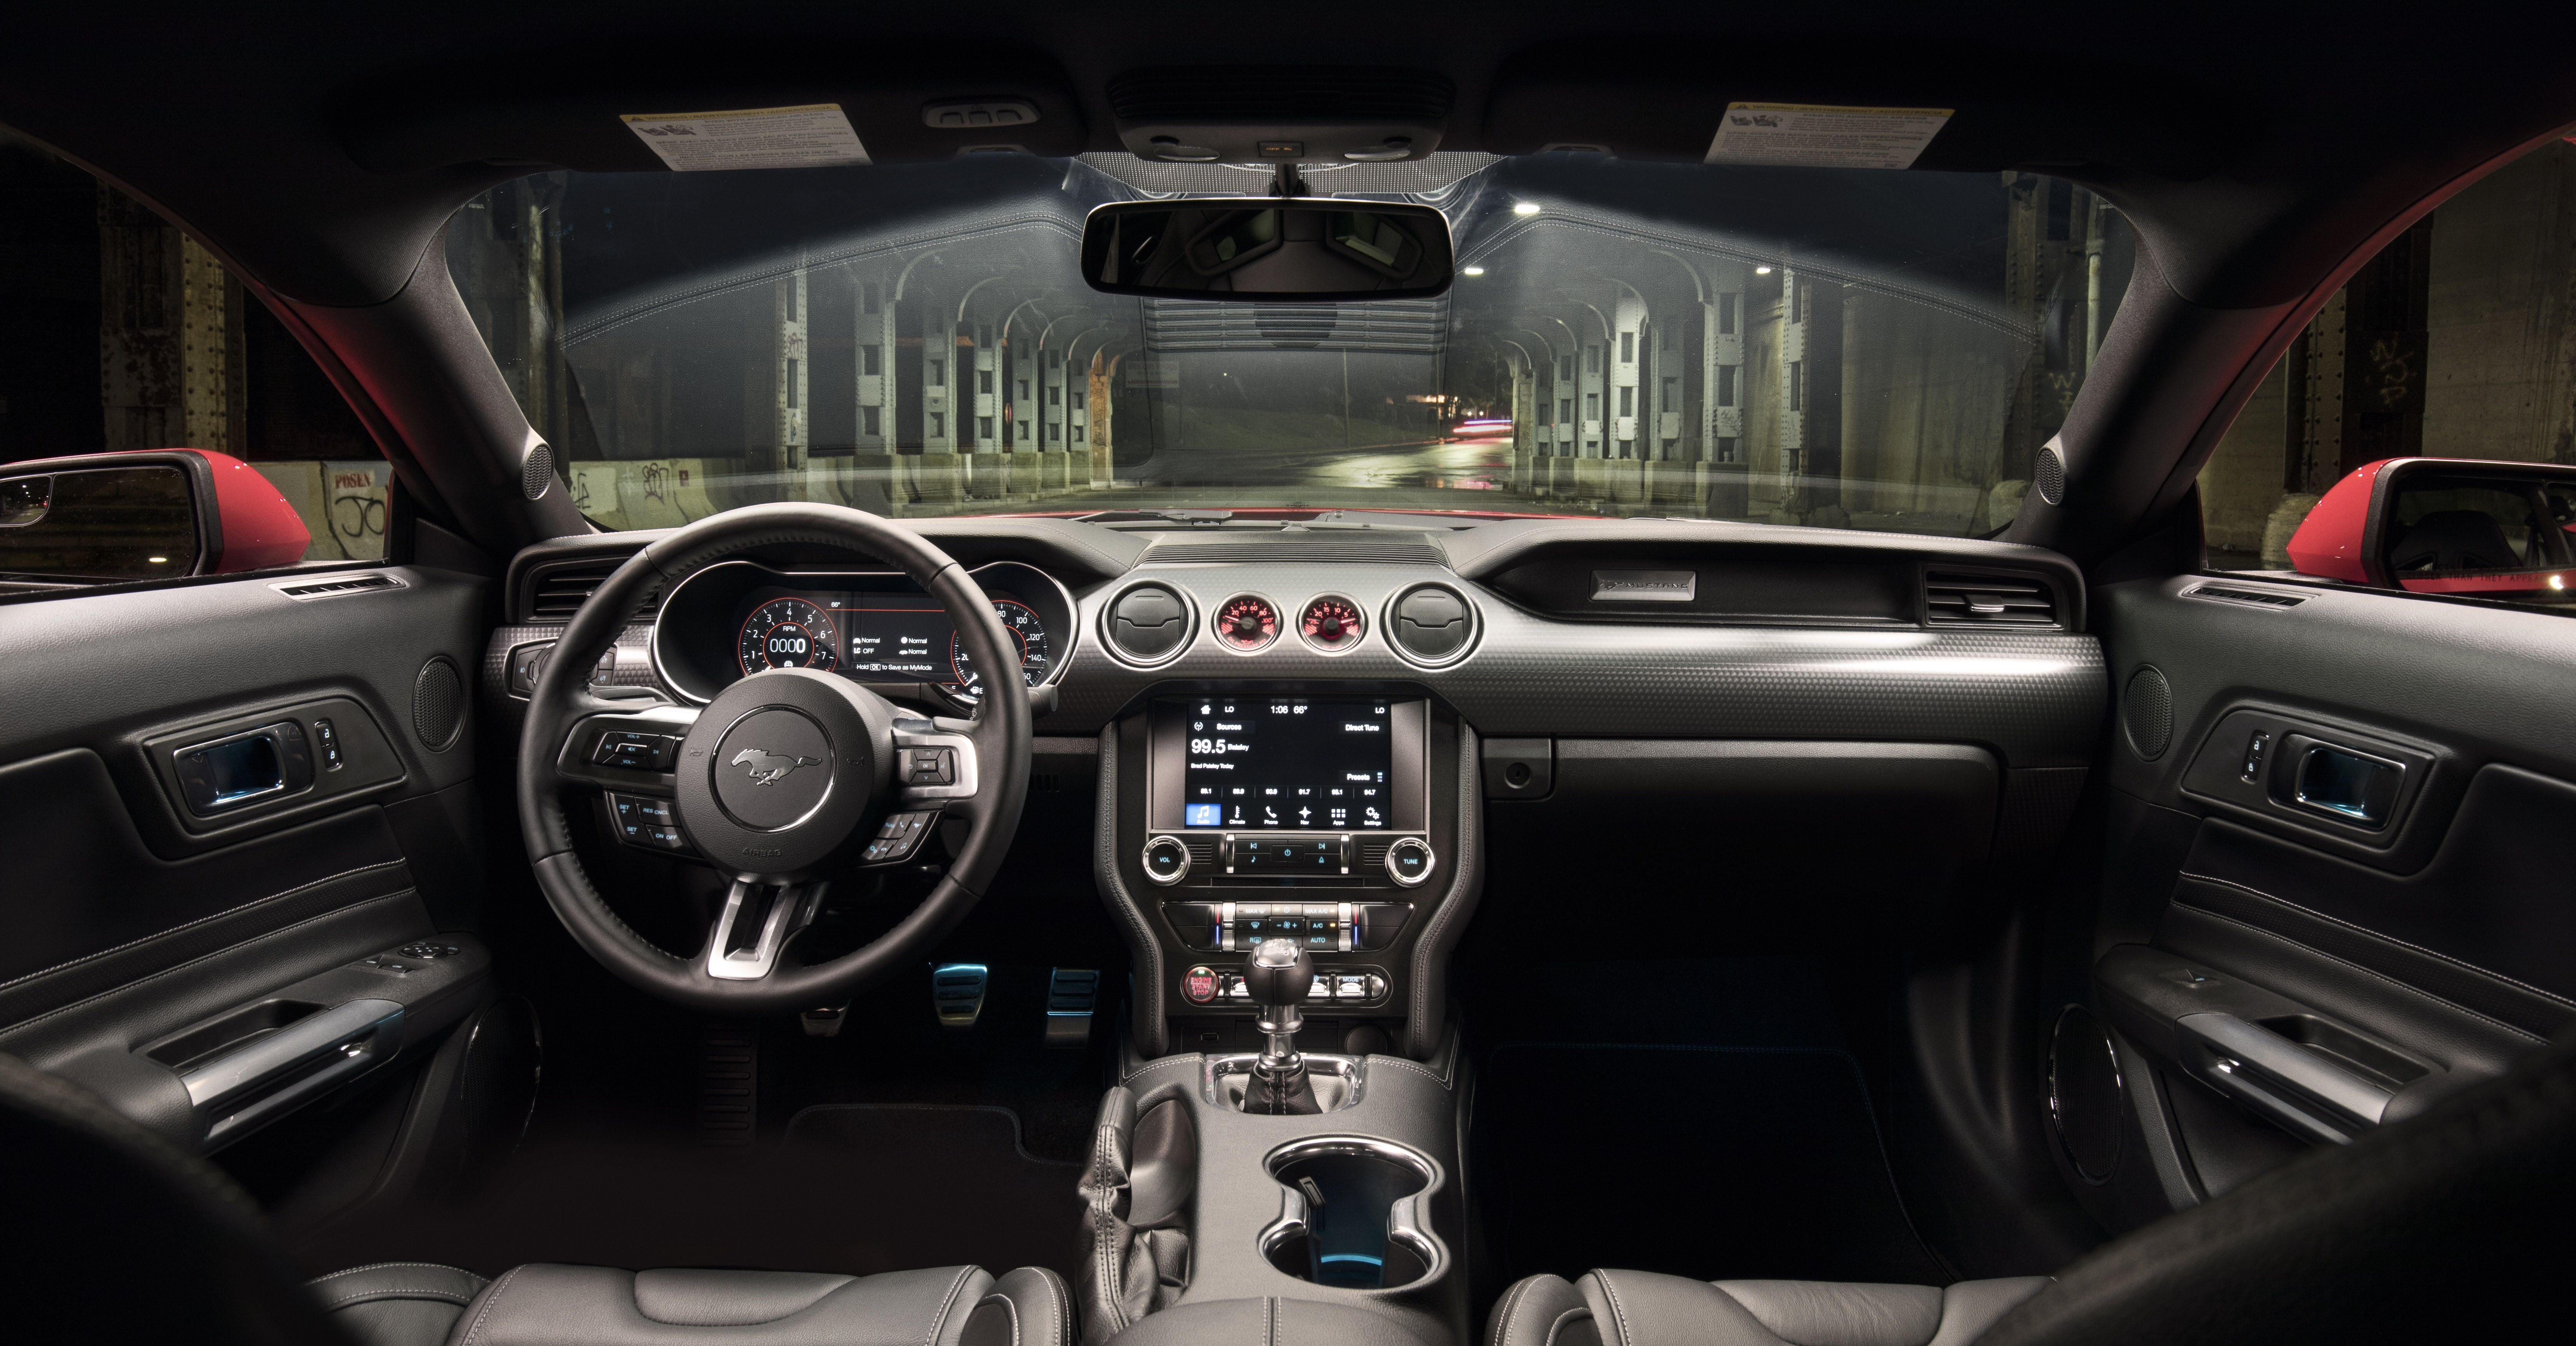 New Ford Trucks Cars Vans Suvs For Sale Edinburg Mcallen Tx Mustang Gt Ford Mustang Mustang Interior